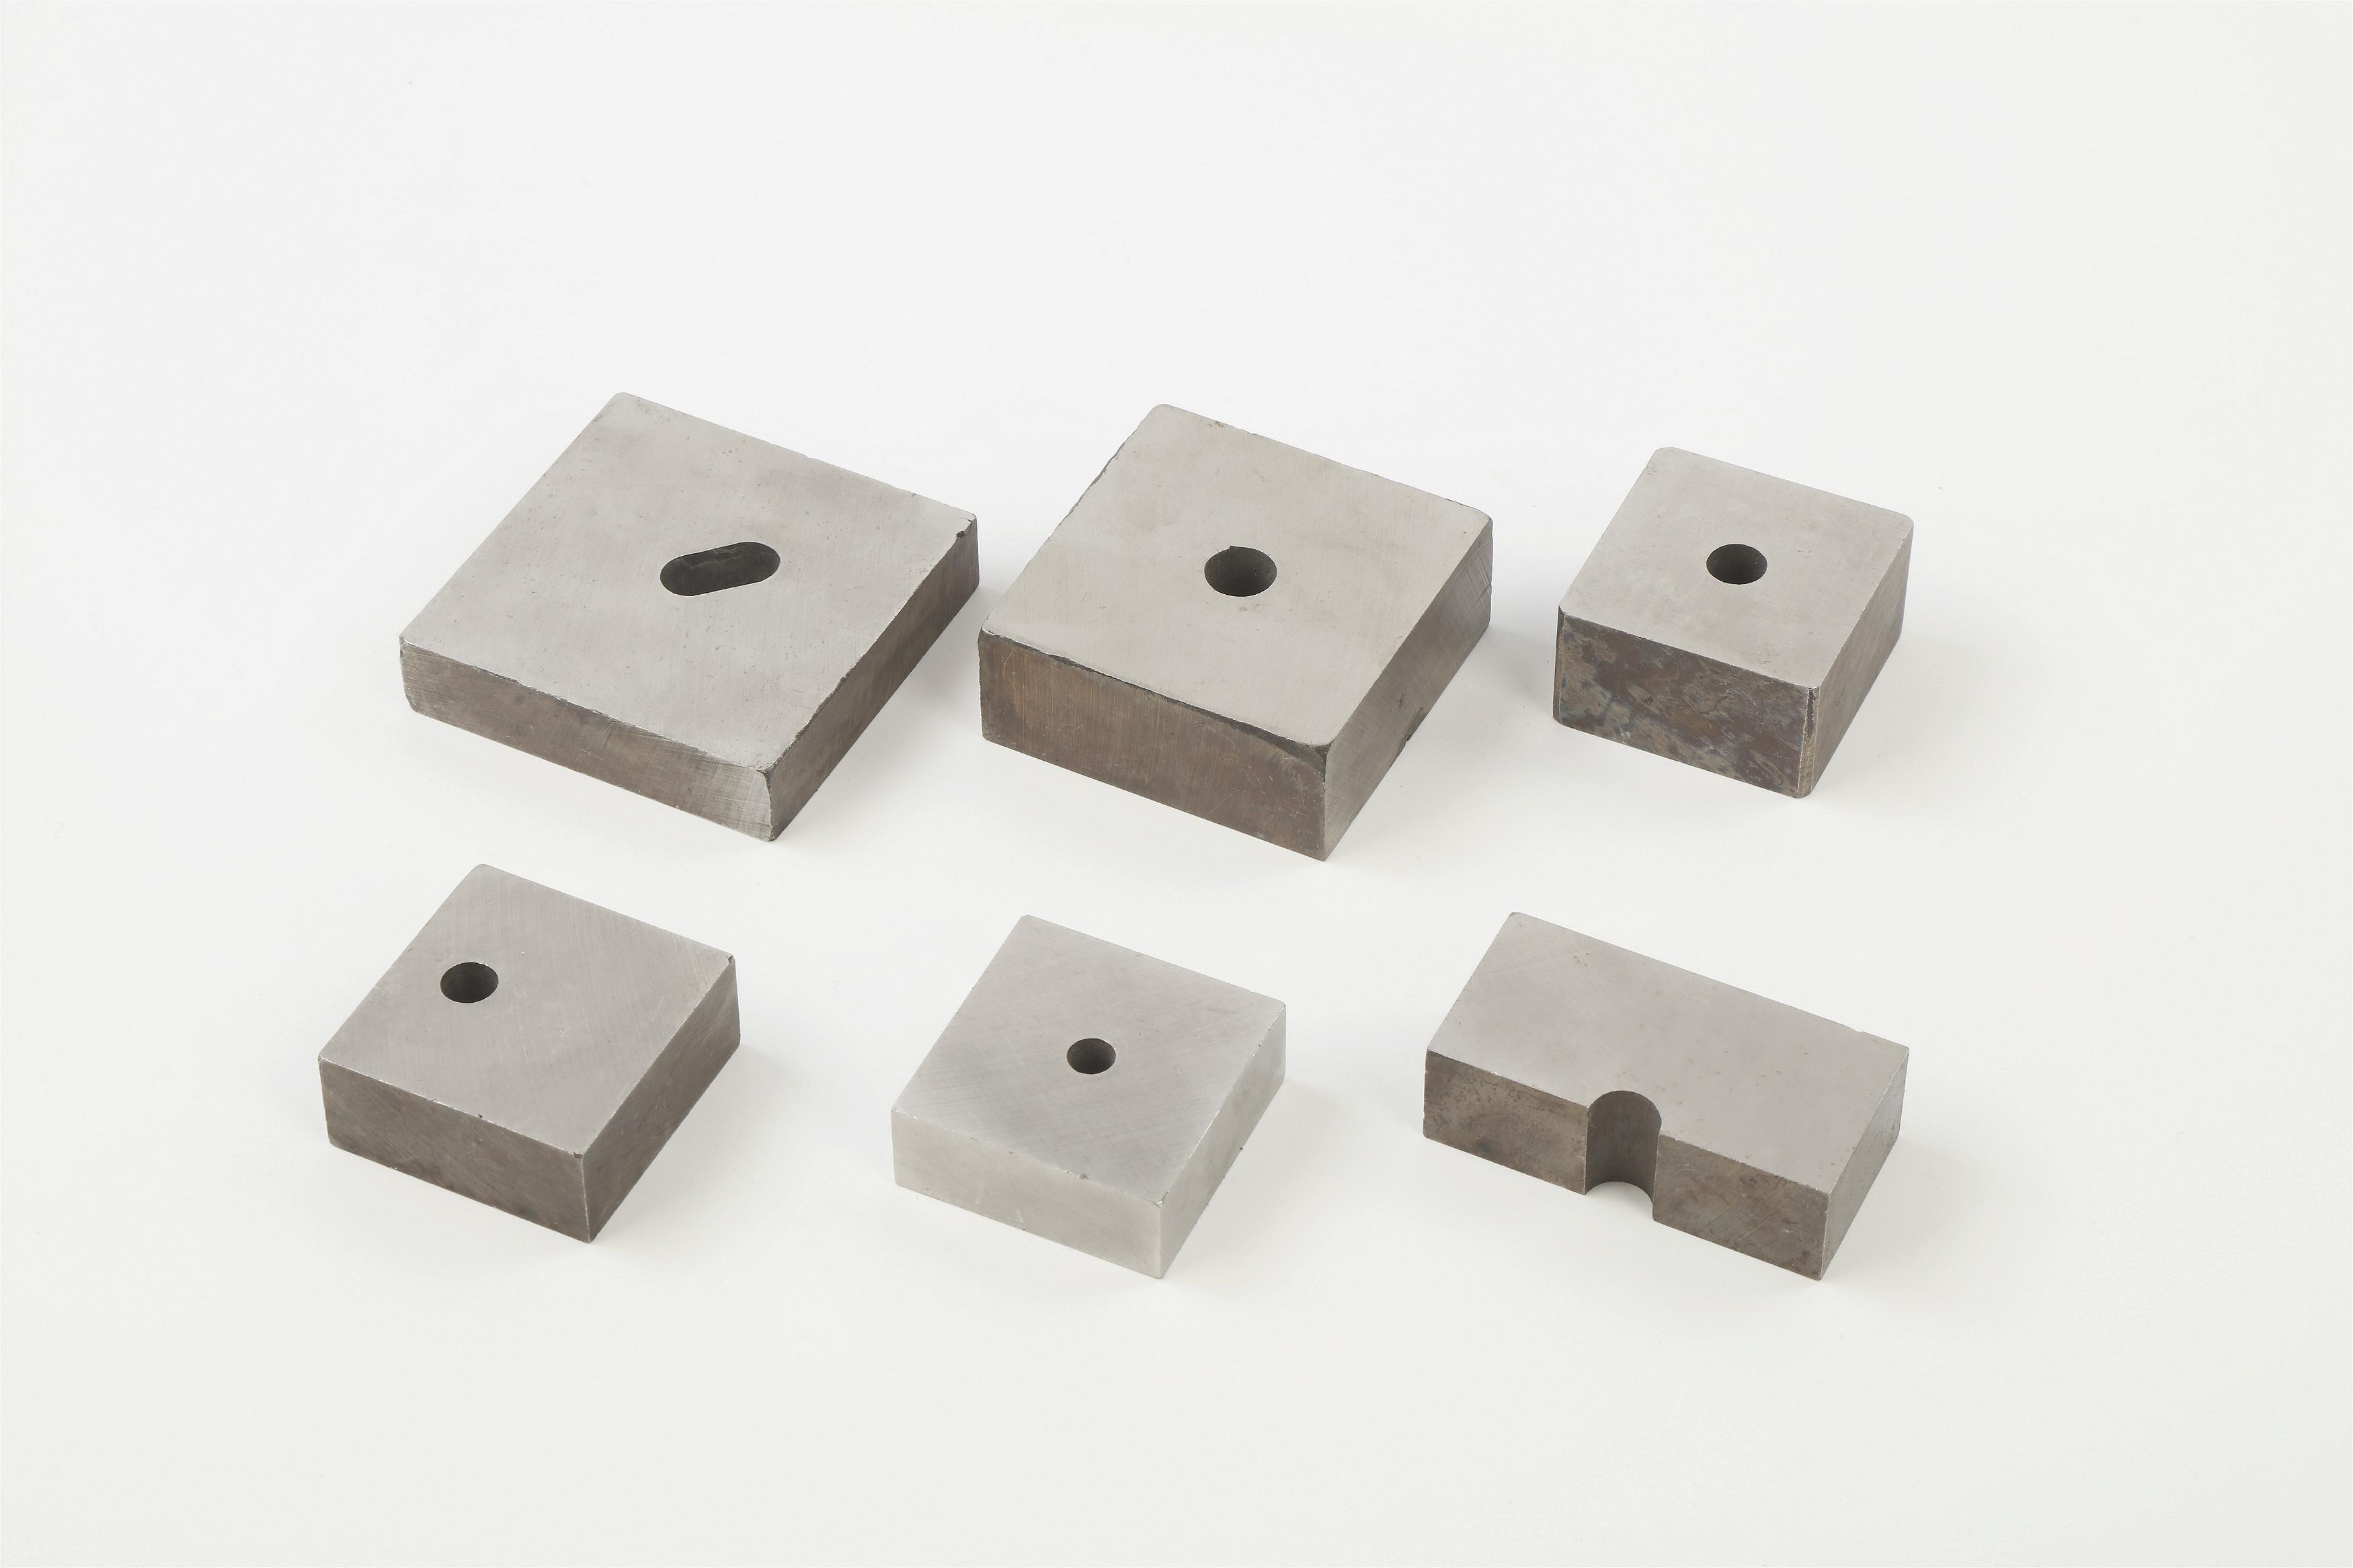 sintered alnico magnets